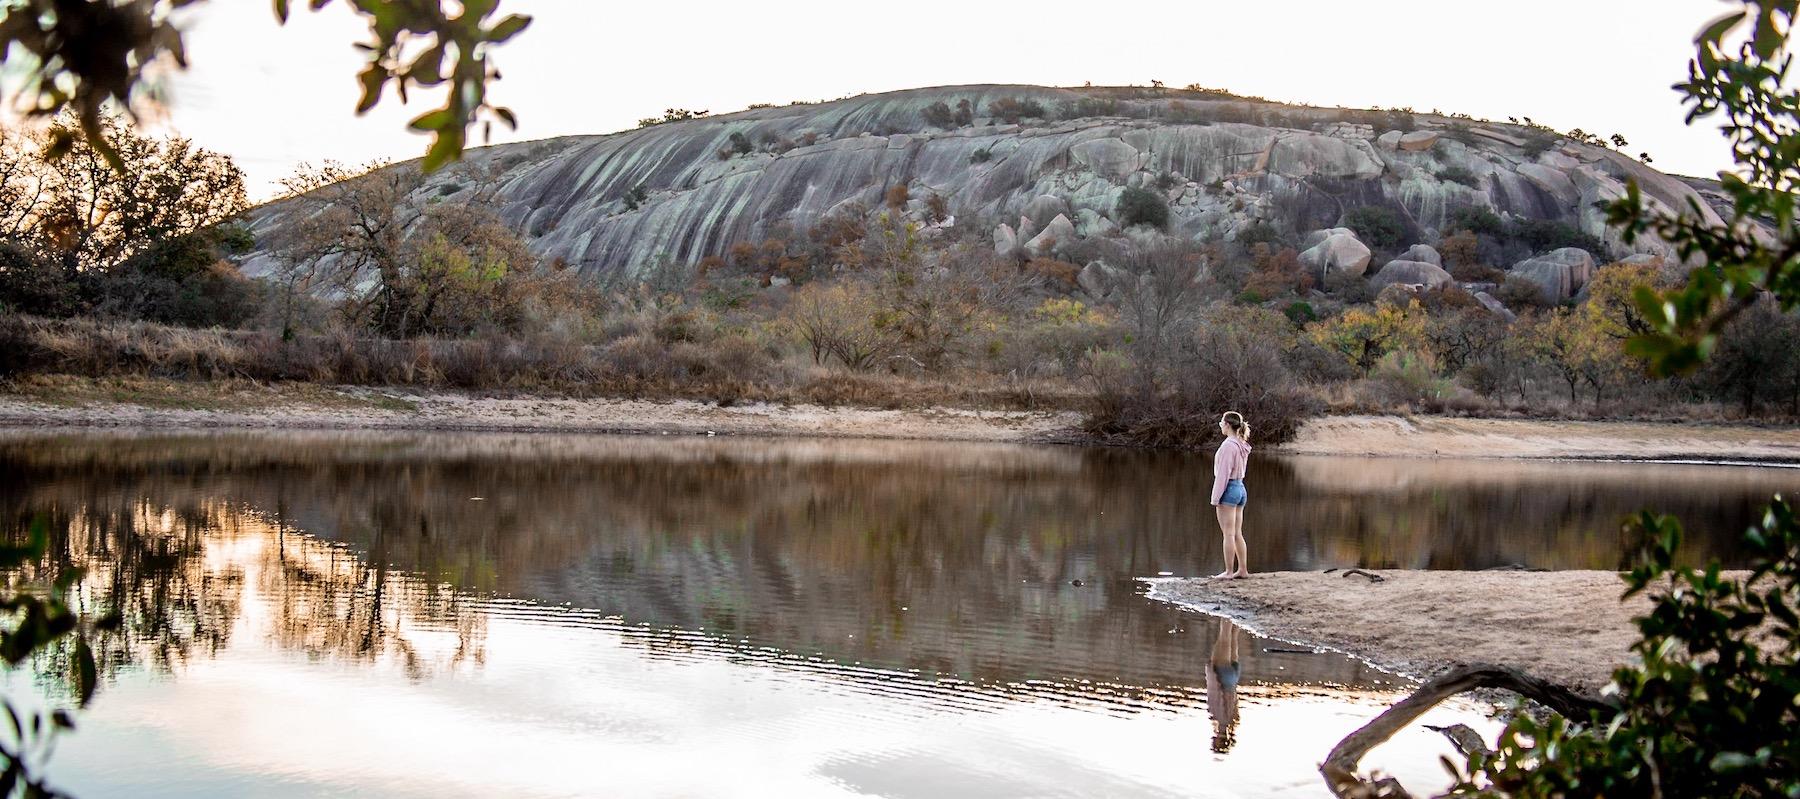 Wild Hixsons Andrea by Water header